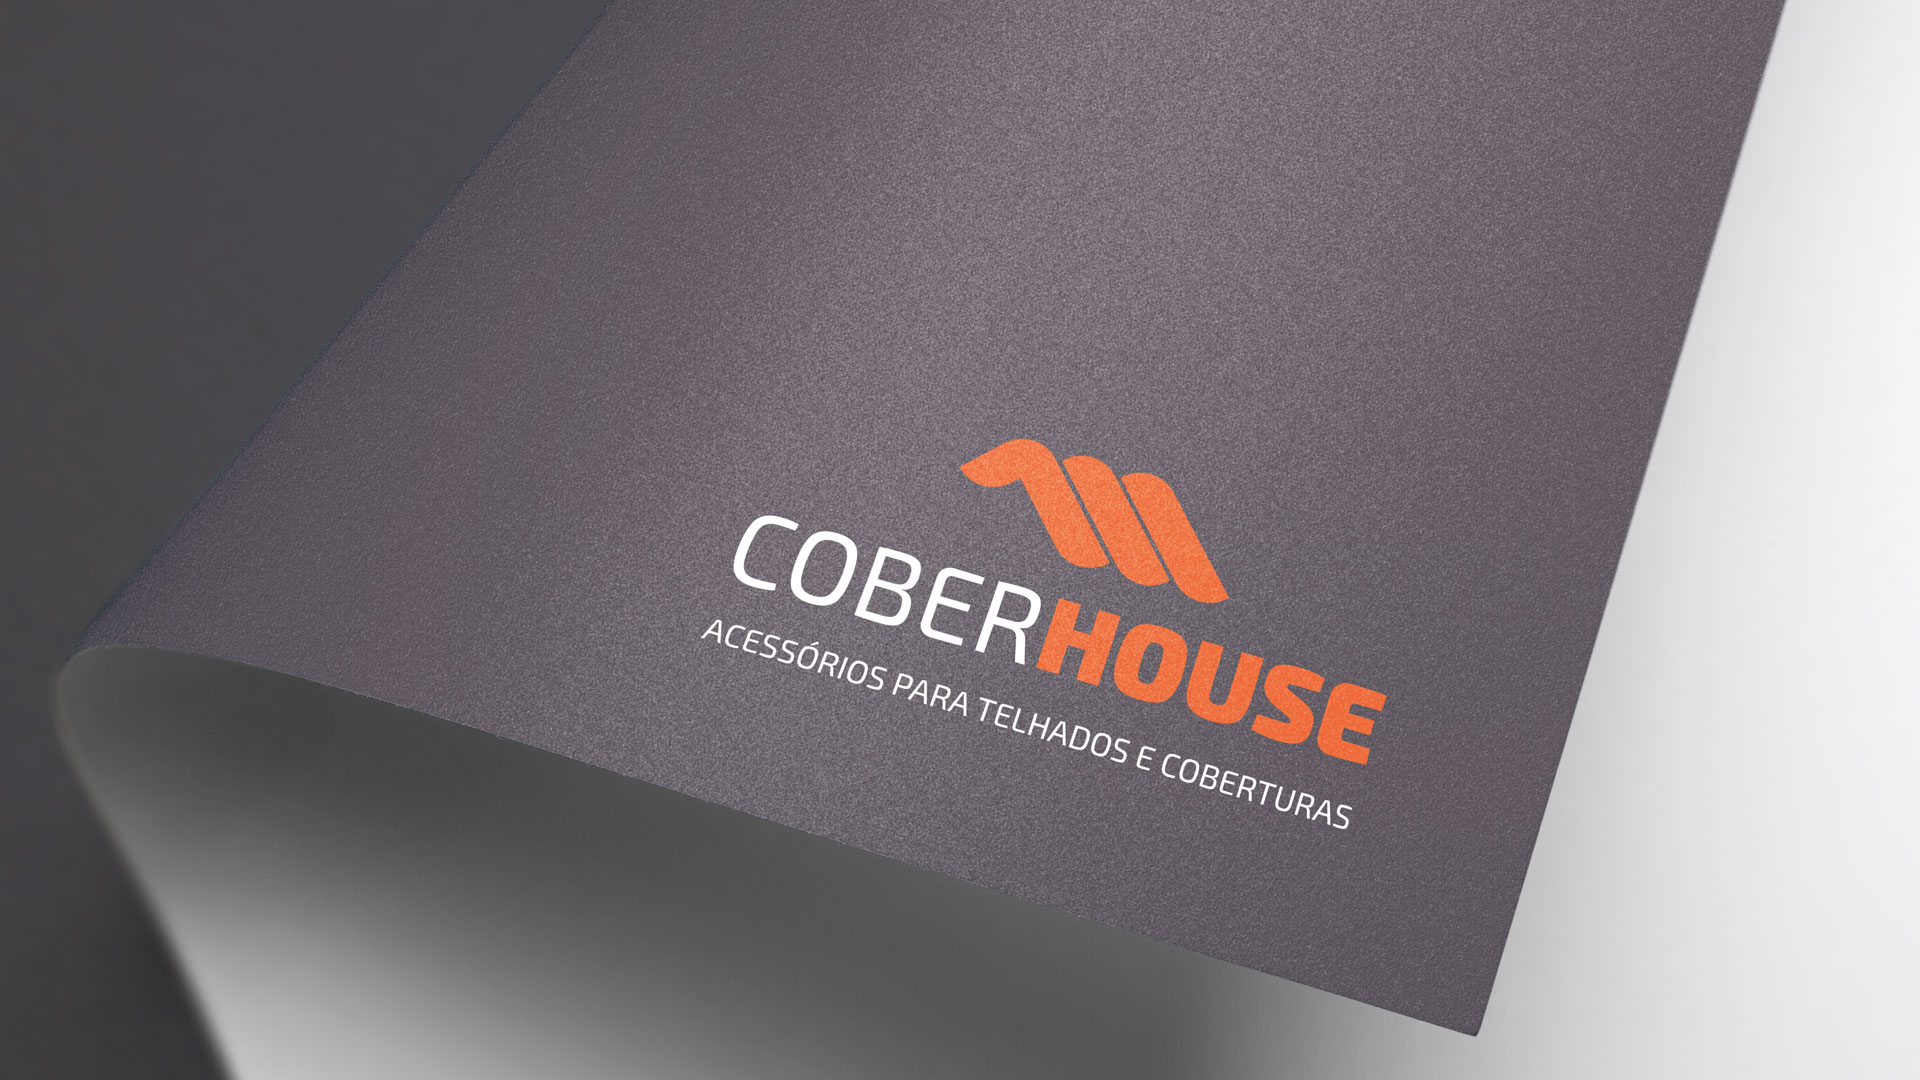 coberhouse_logo1